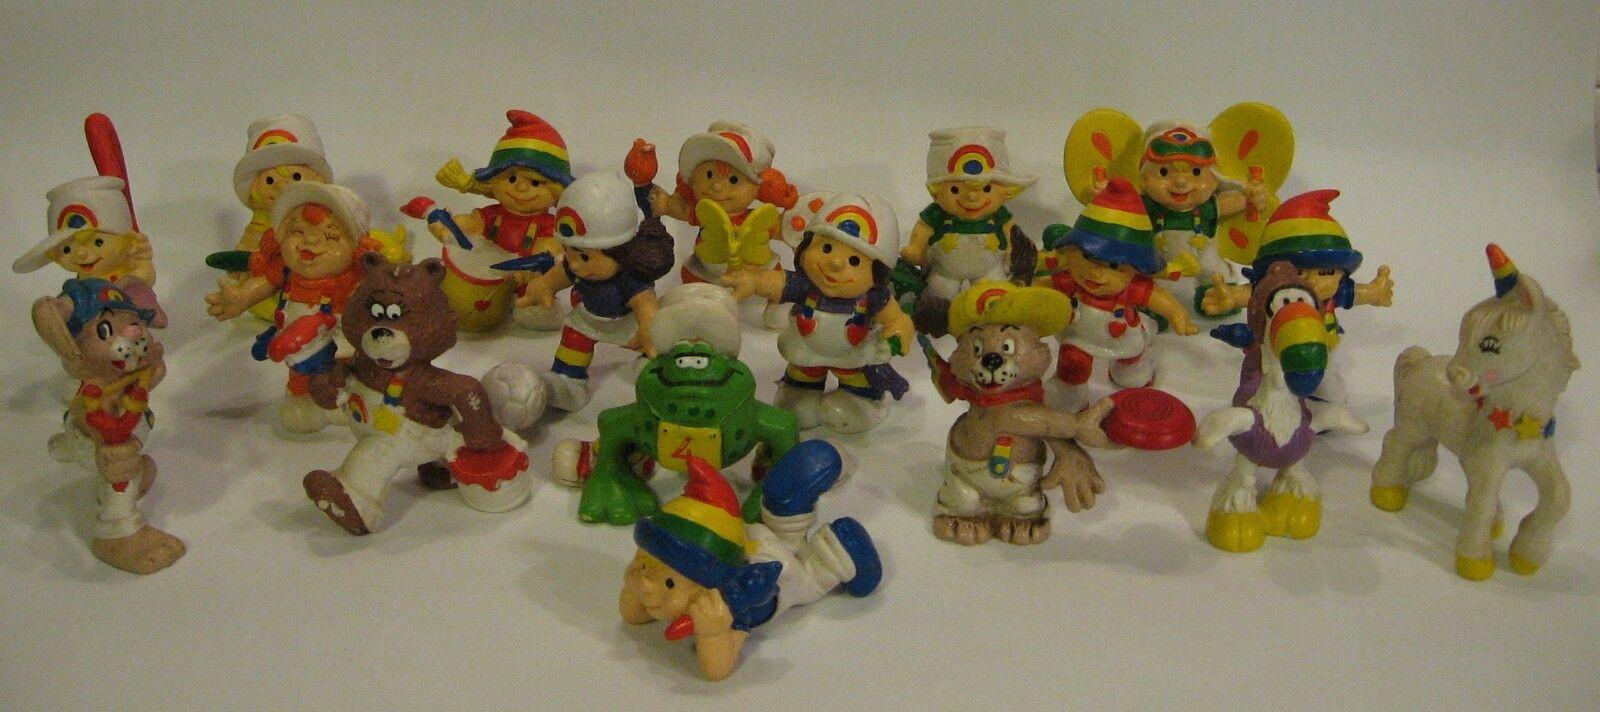 Rare RAINBOW KIDS, 18 PVC FIGURES, W. Berrie, MAIA & BORGES (M+B) PORTUGAL,1981.